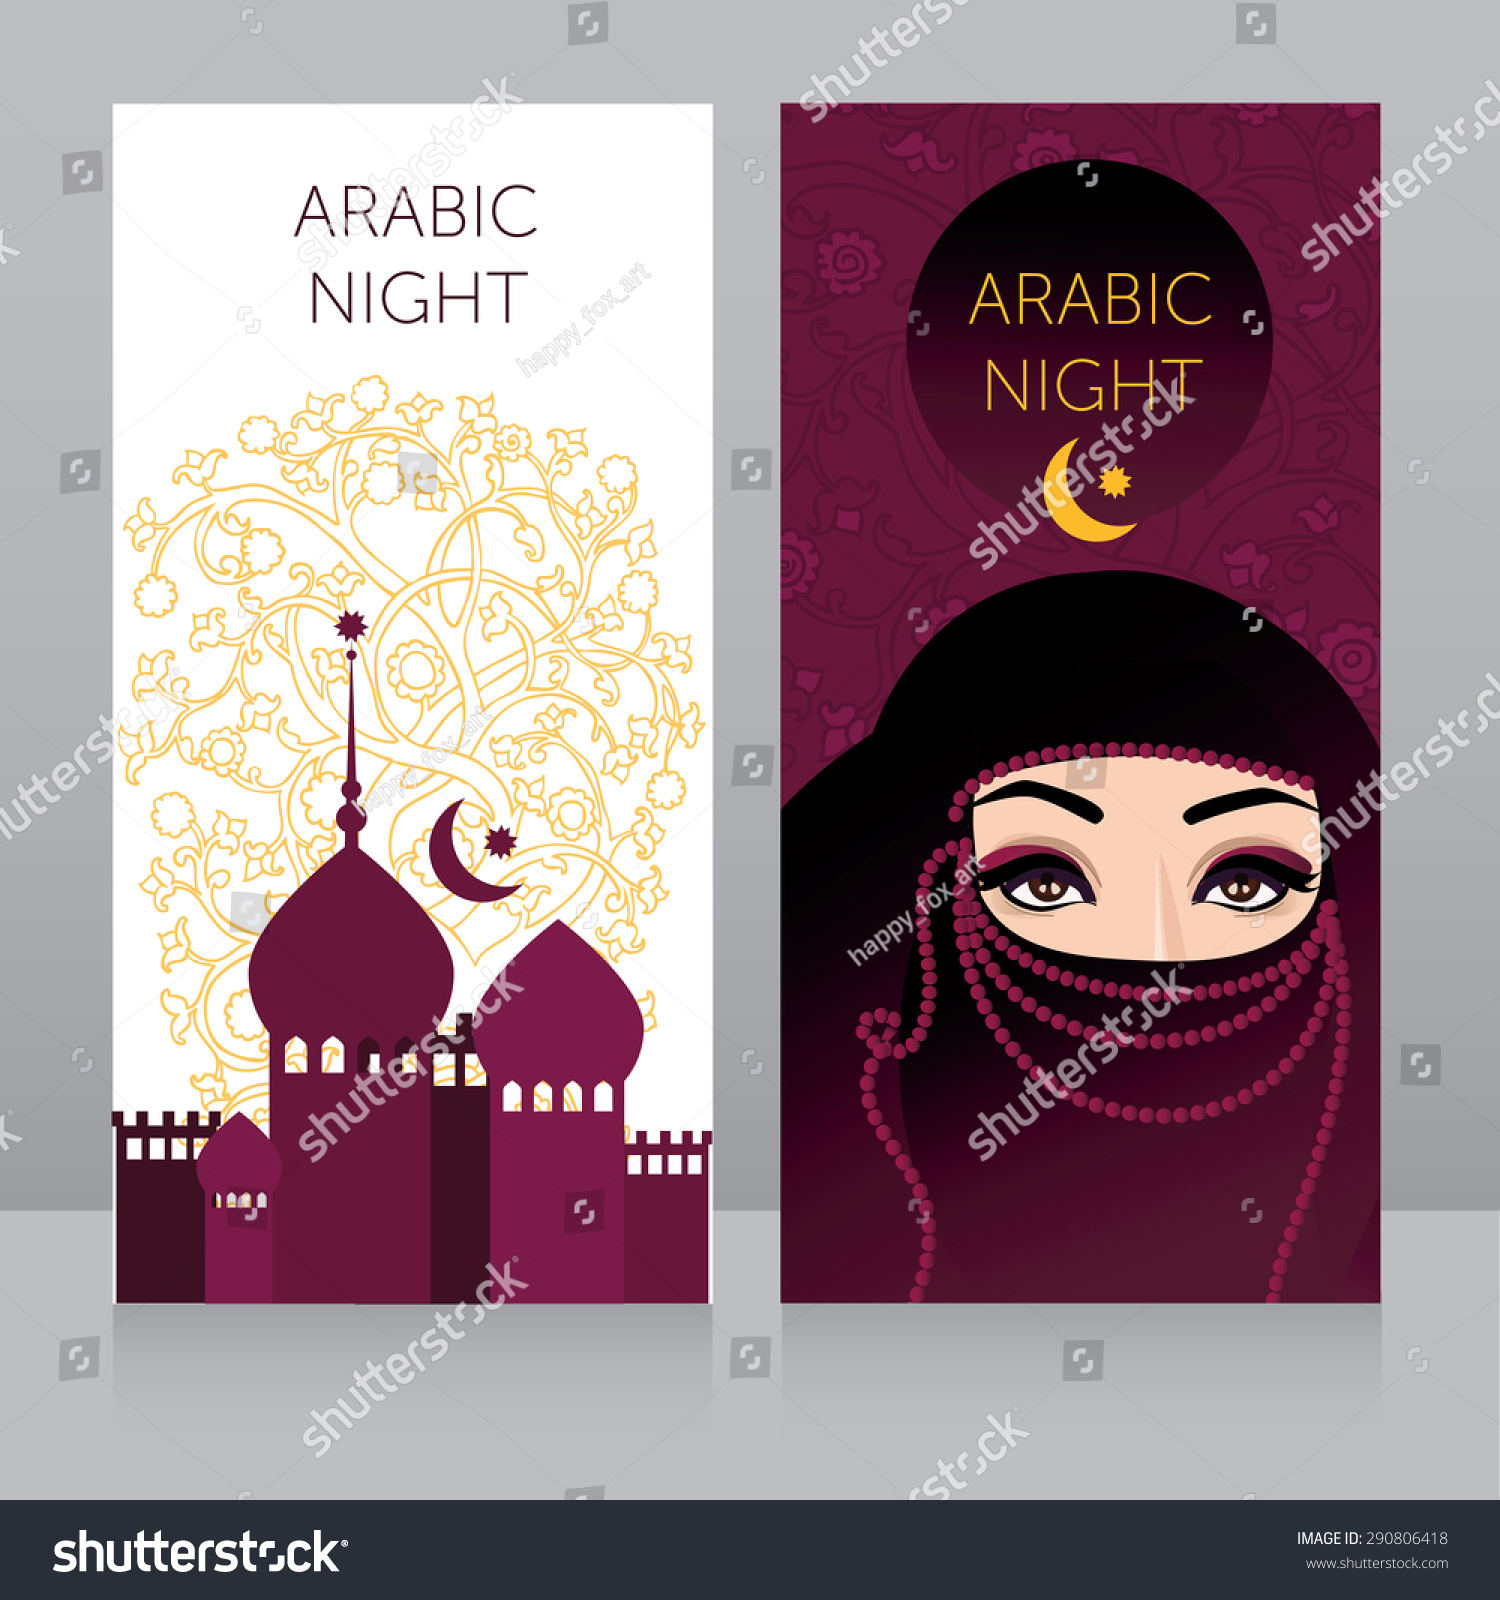 Beautiful invitation template arabian night partytemplate stock beautiful invitation template for arabian night partytemplate for muslim holiday card touristic banner stopboris Choice Image